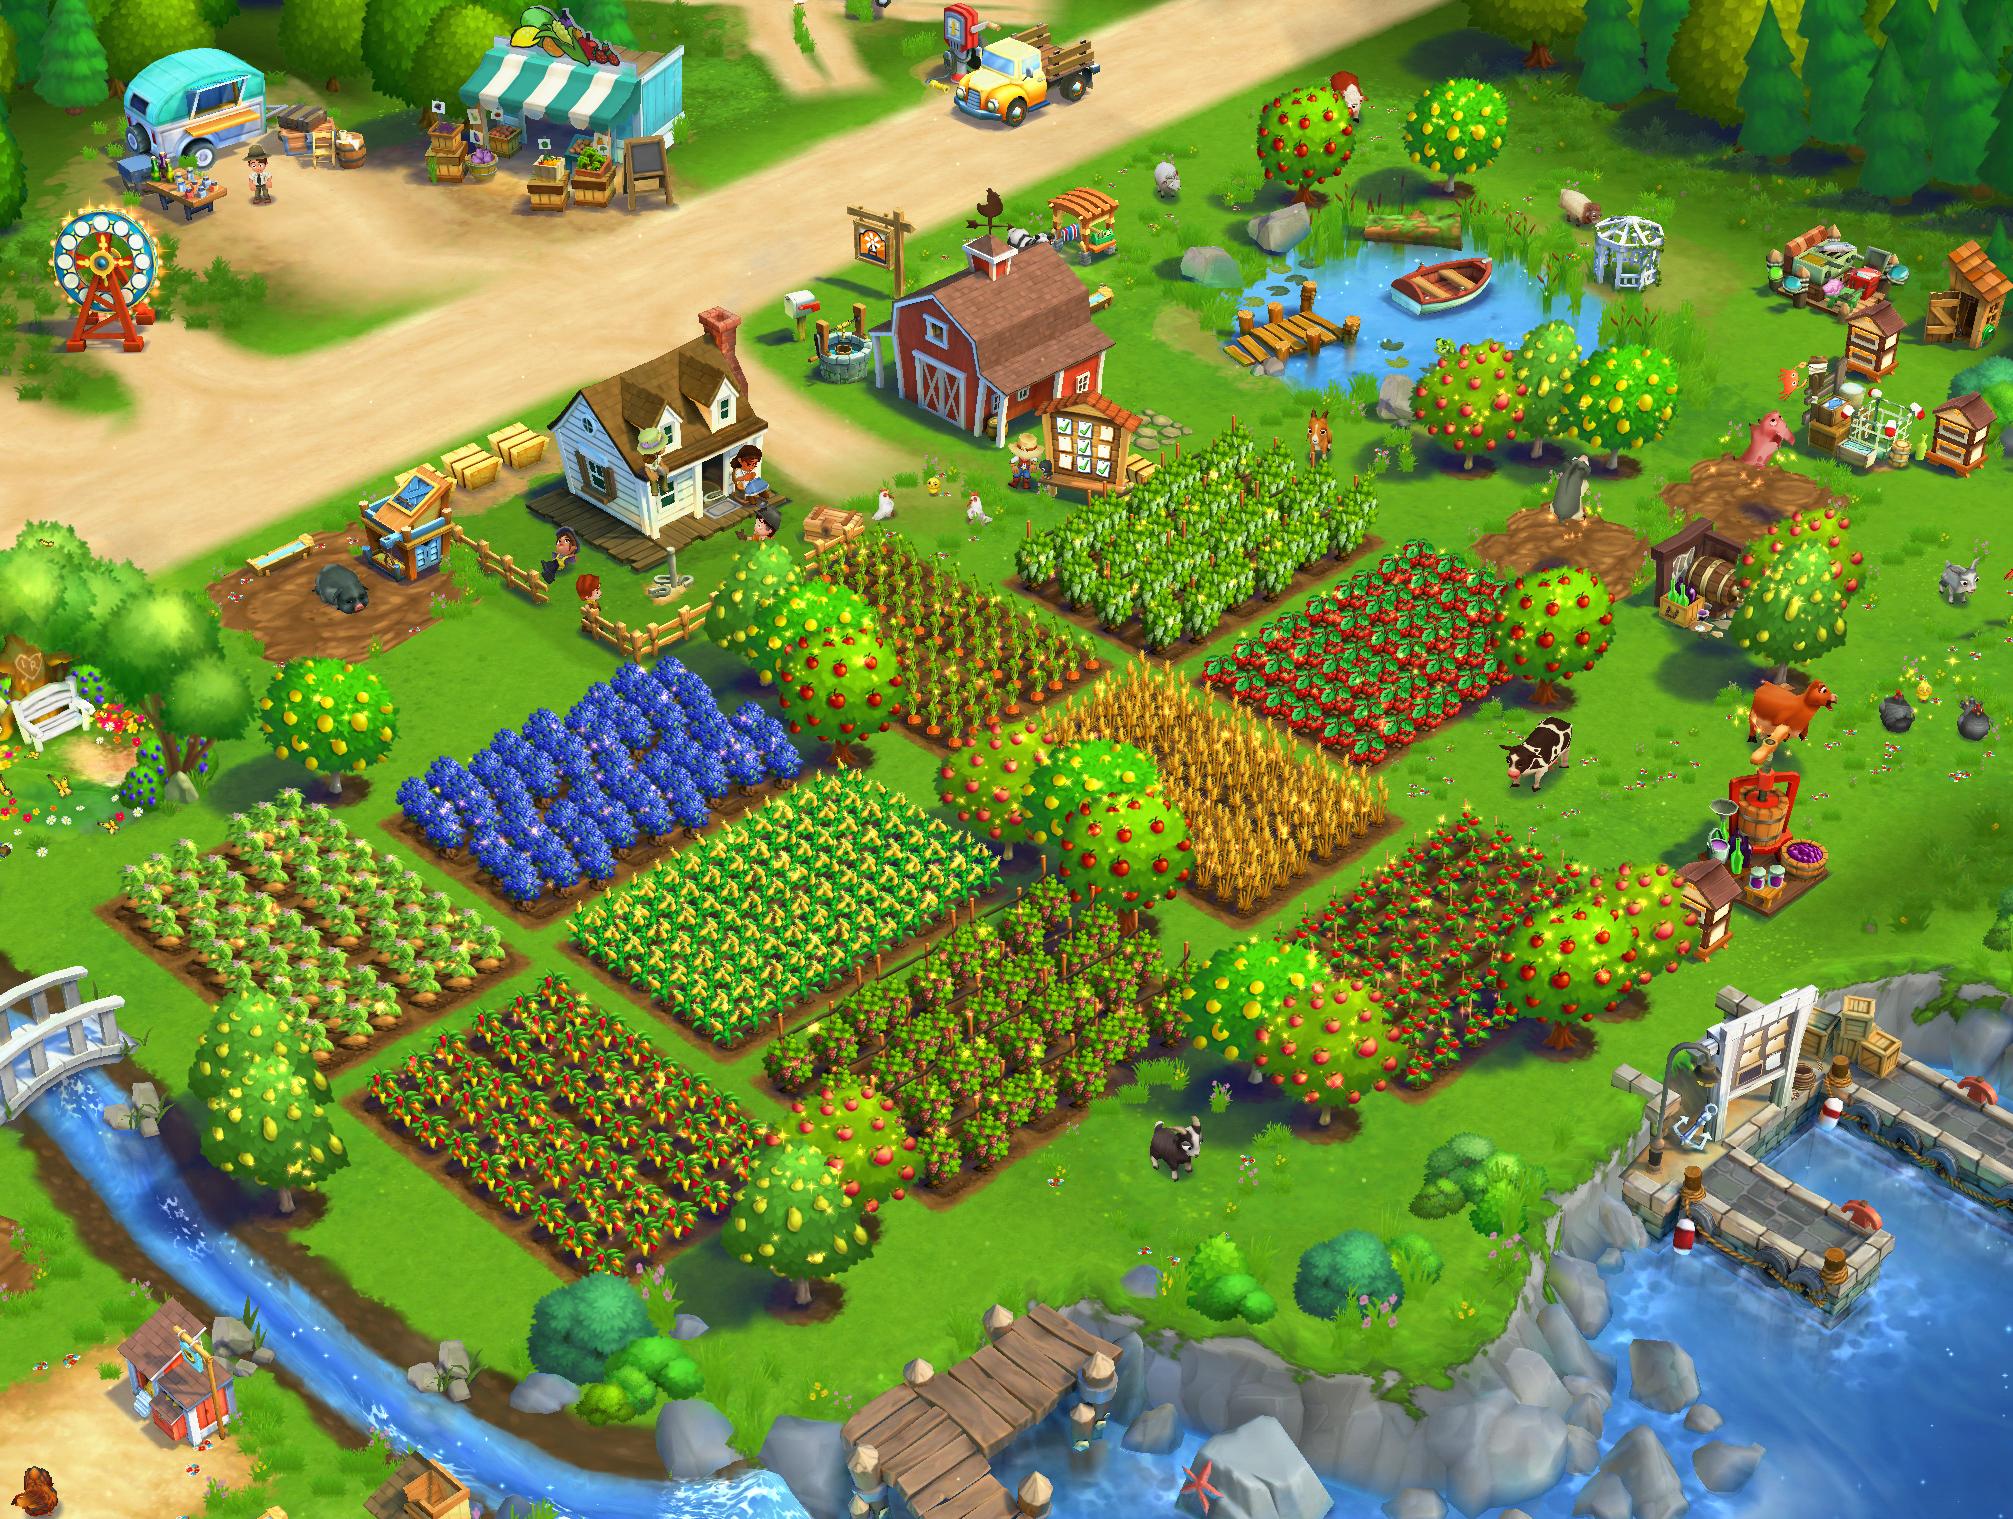 Zynga Games Farmville